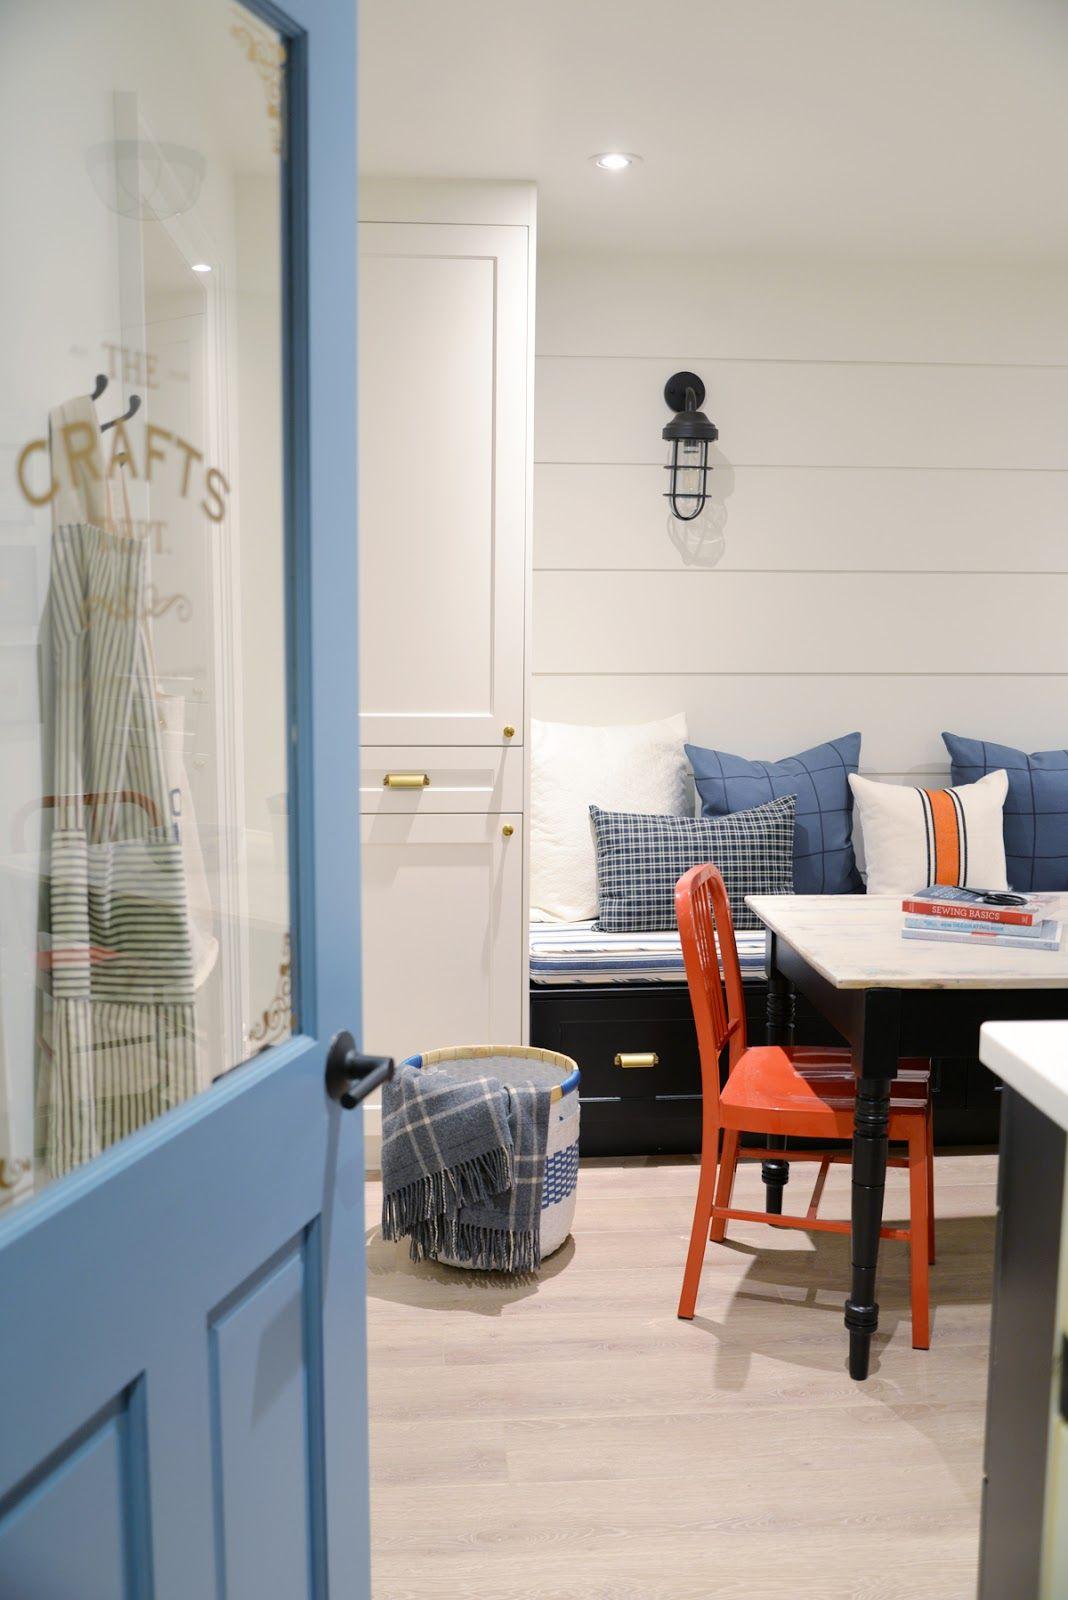 A Modern Coastal Craft Room Reveal ProjectCraftsDept